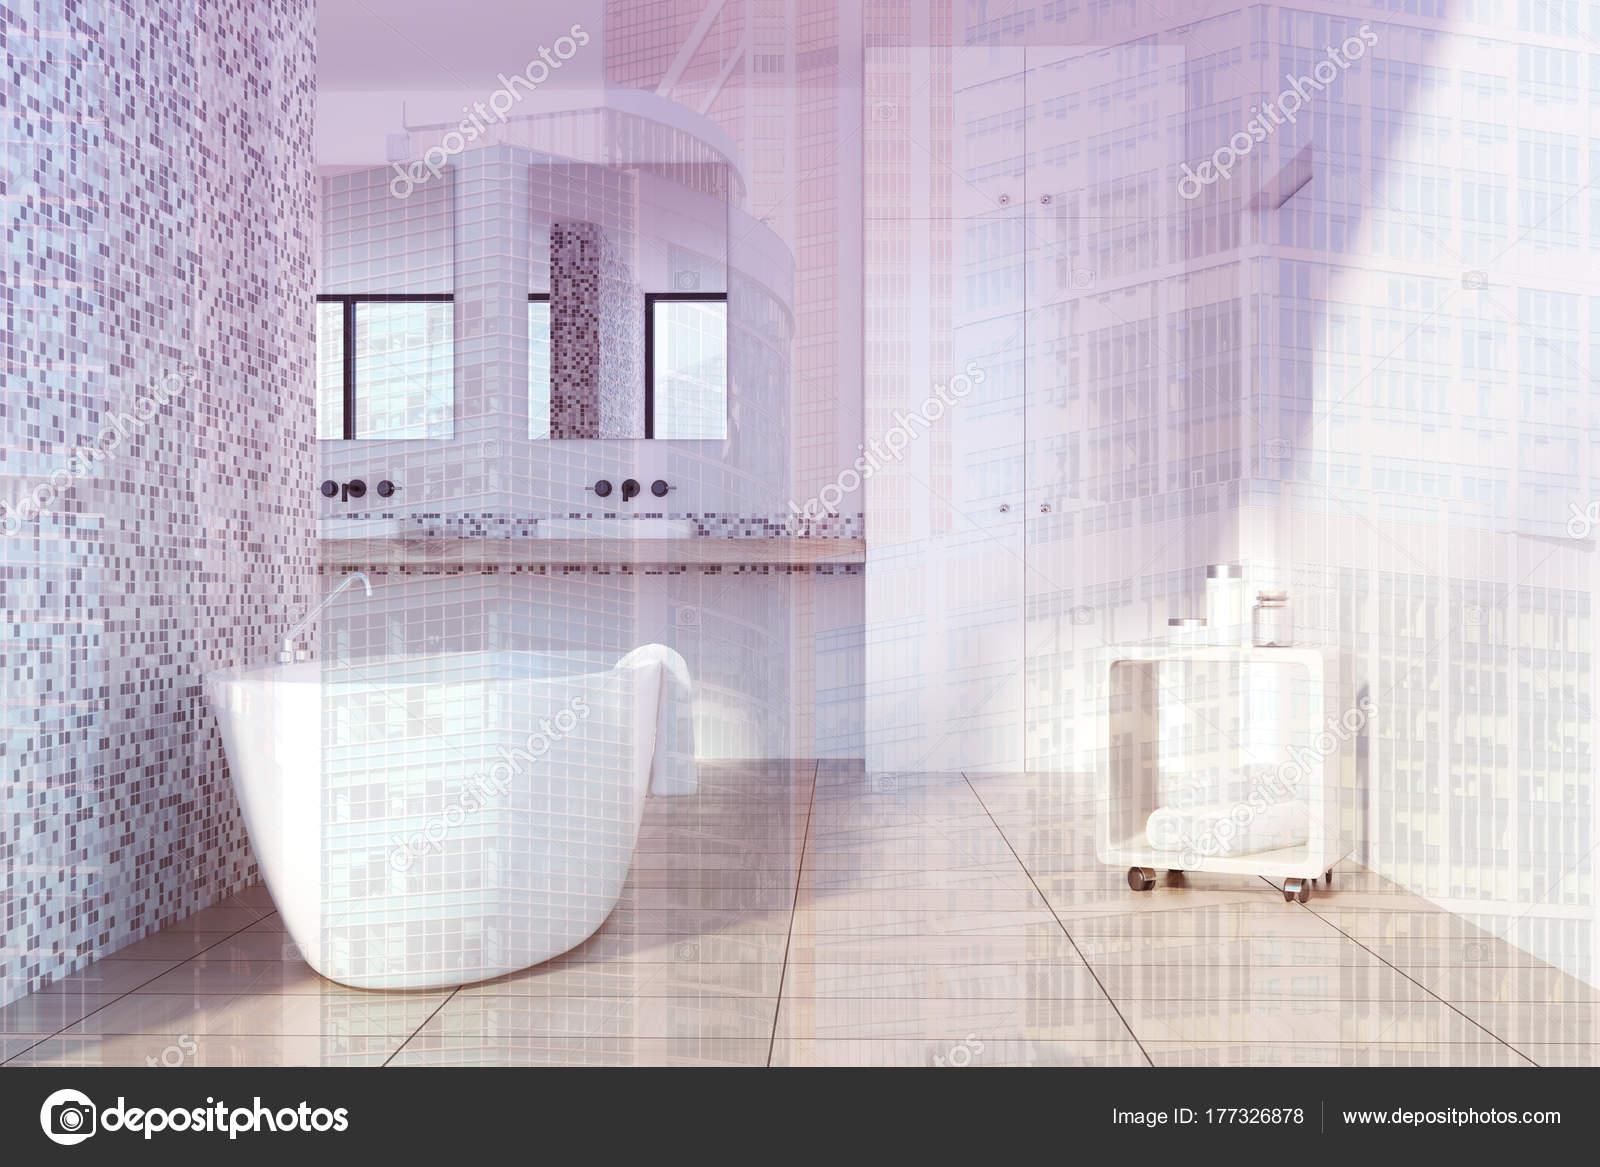 Vasca da bagno bianco grigio piastrella tonico u foto stock